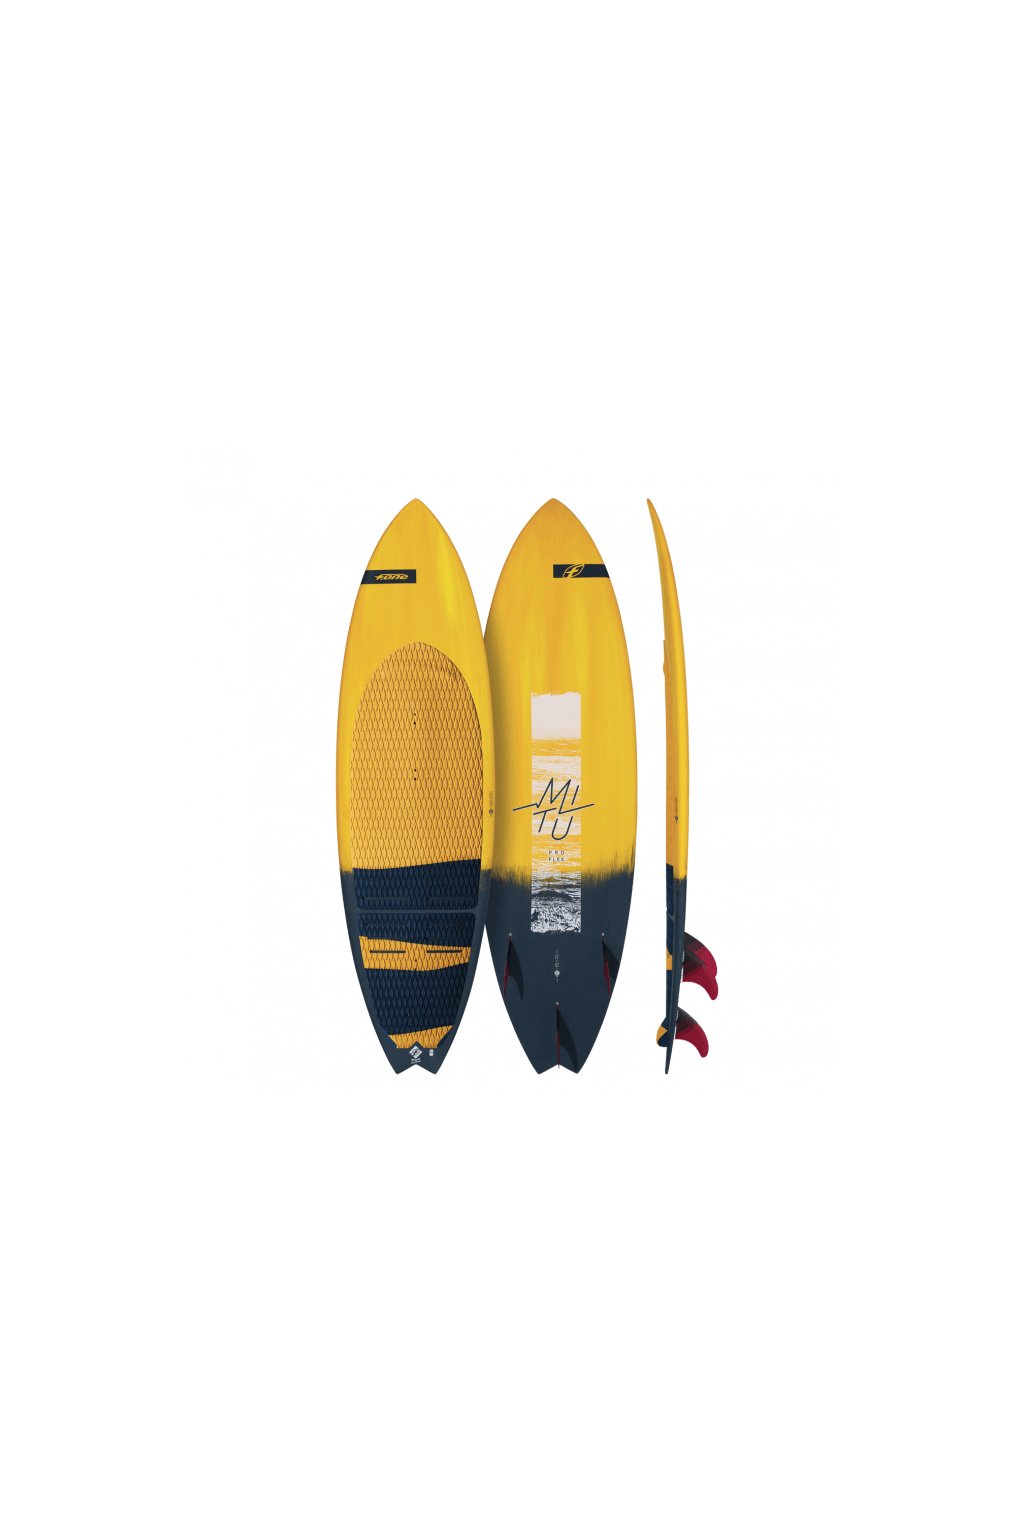 Surf Mitu Pro flex 650x650